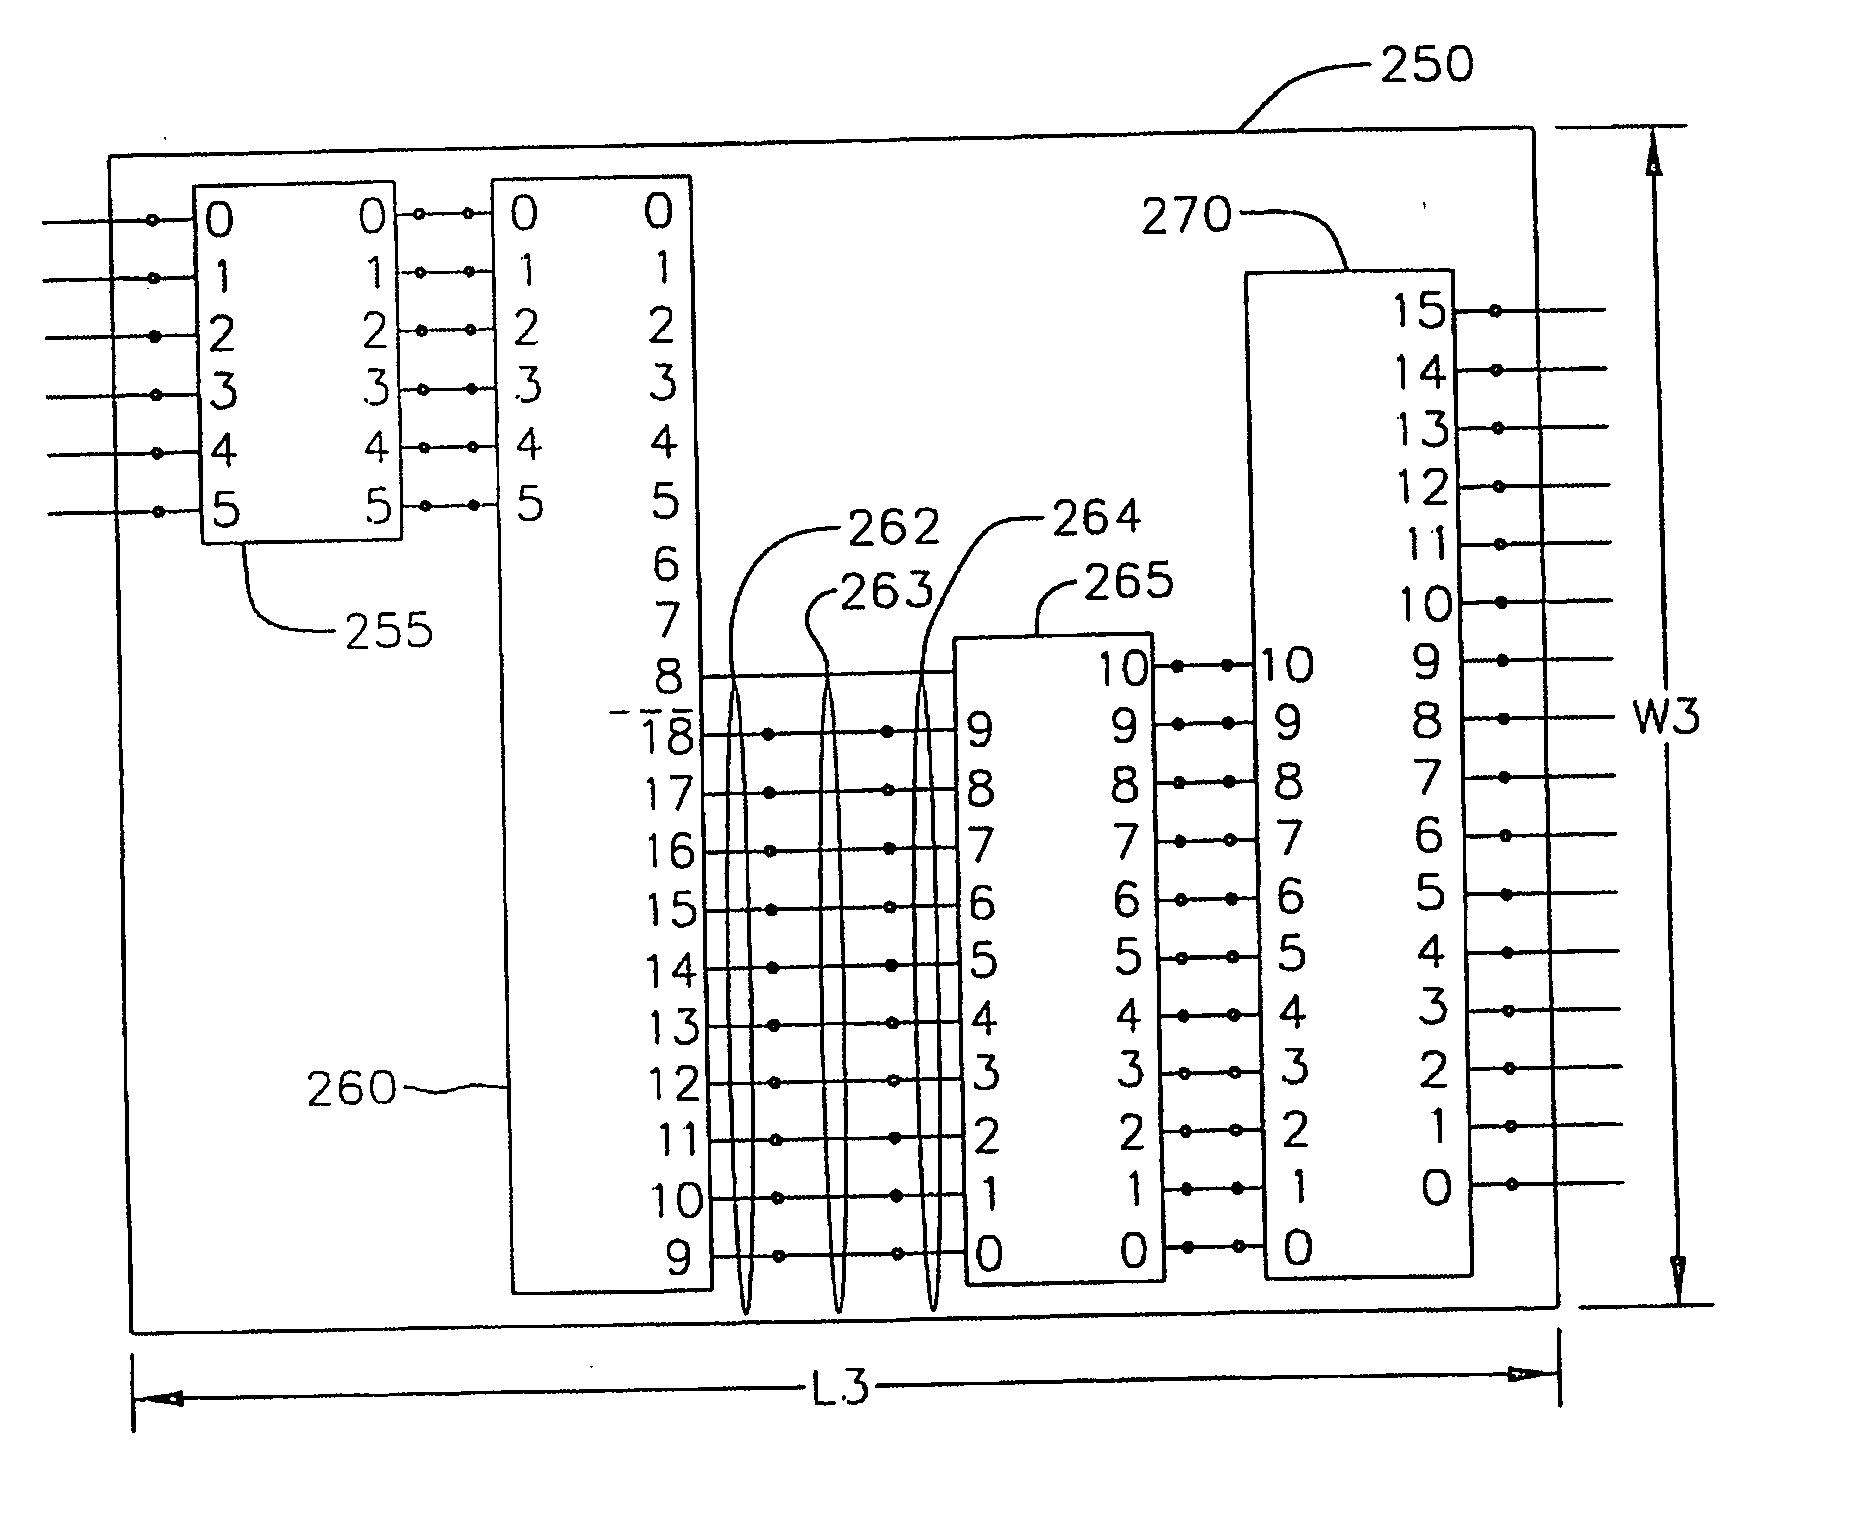 2004 honda f4i wiring diagram